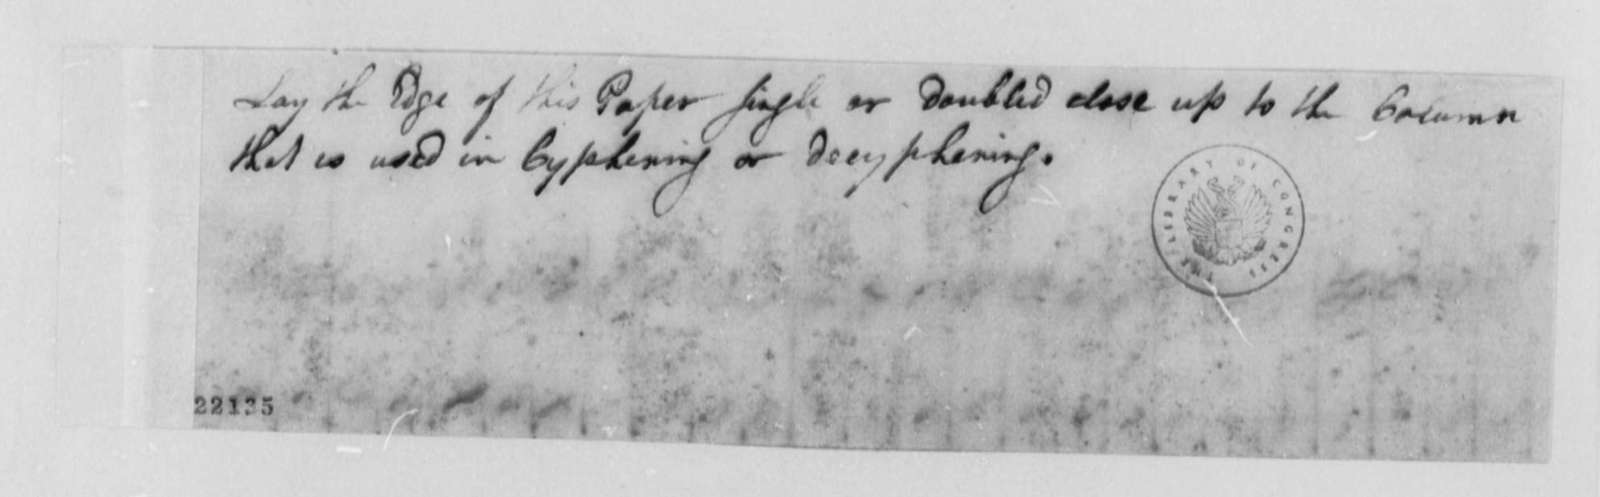 Thomas Jefferson, 1802, Ciphers and Data